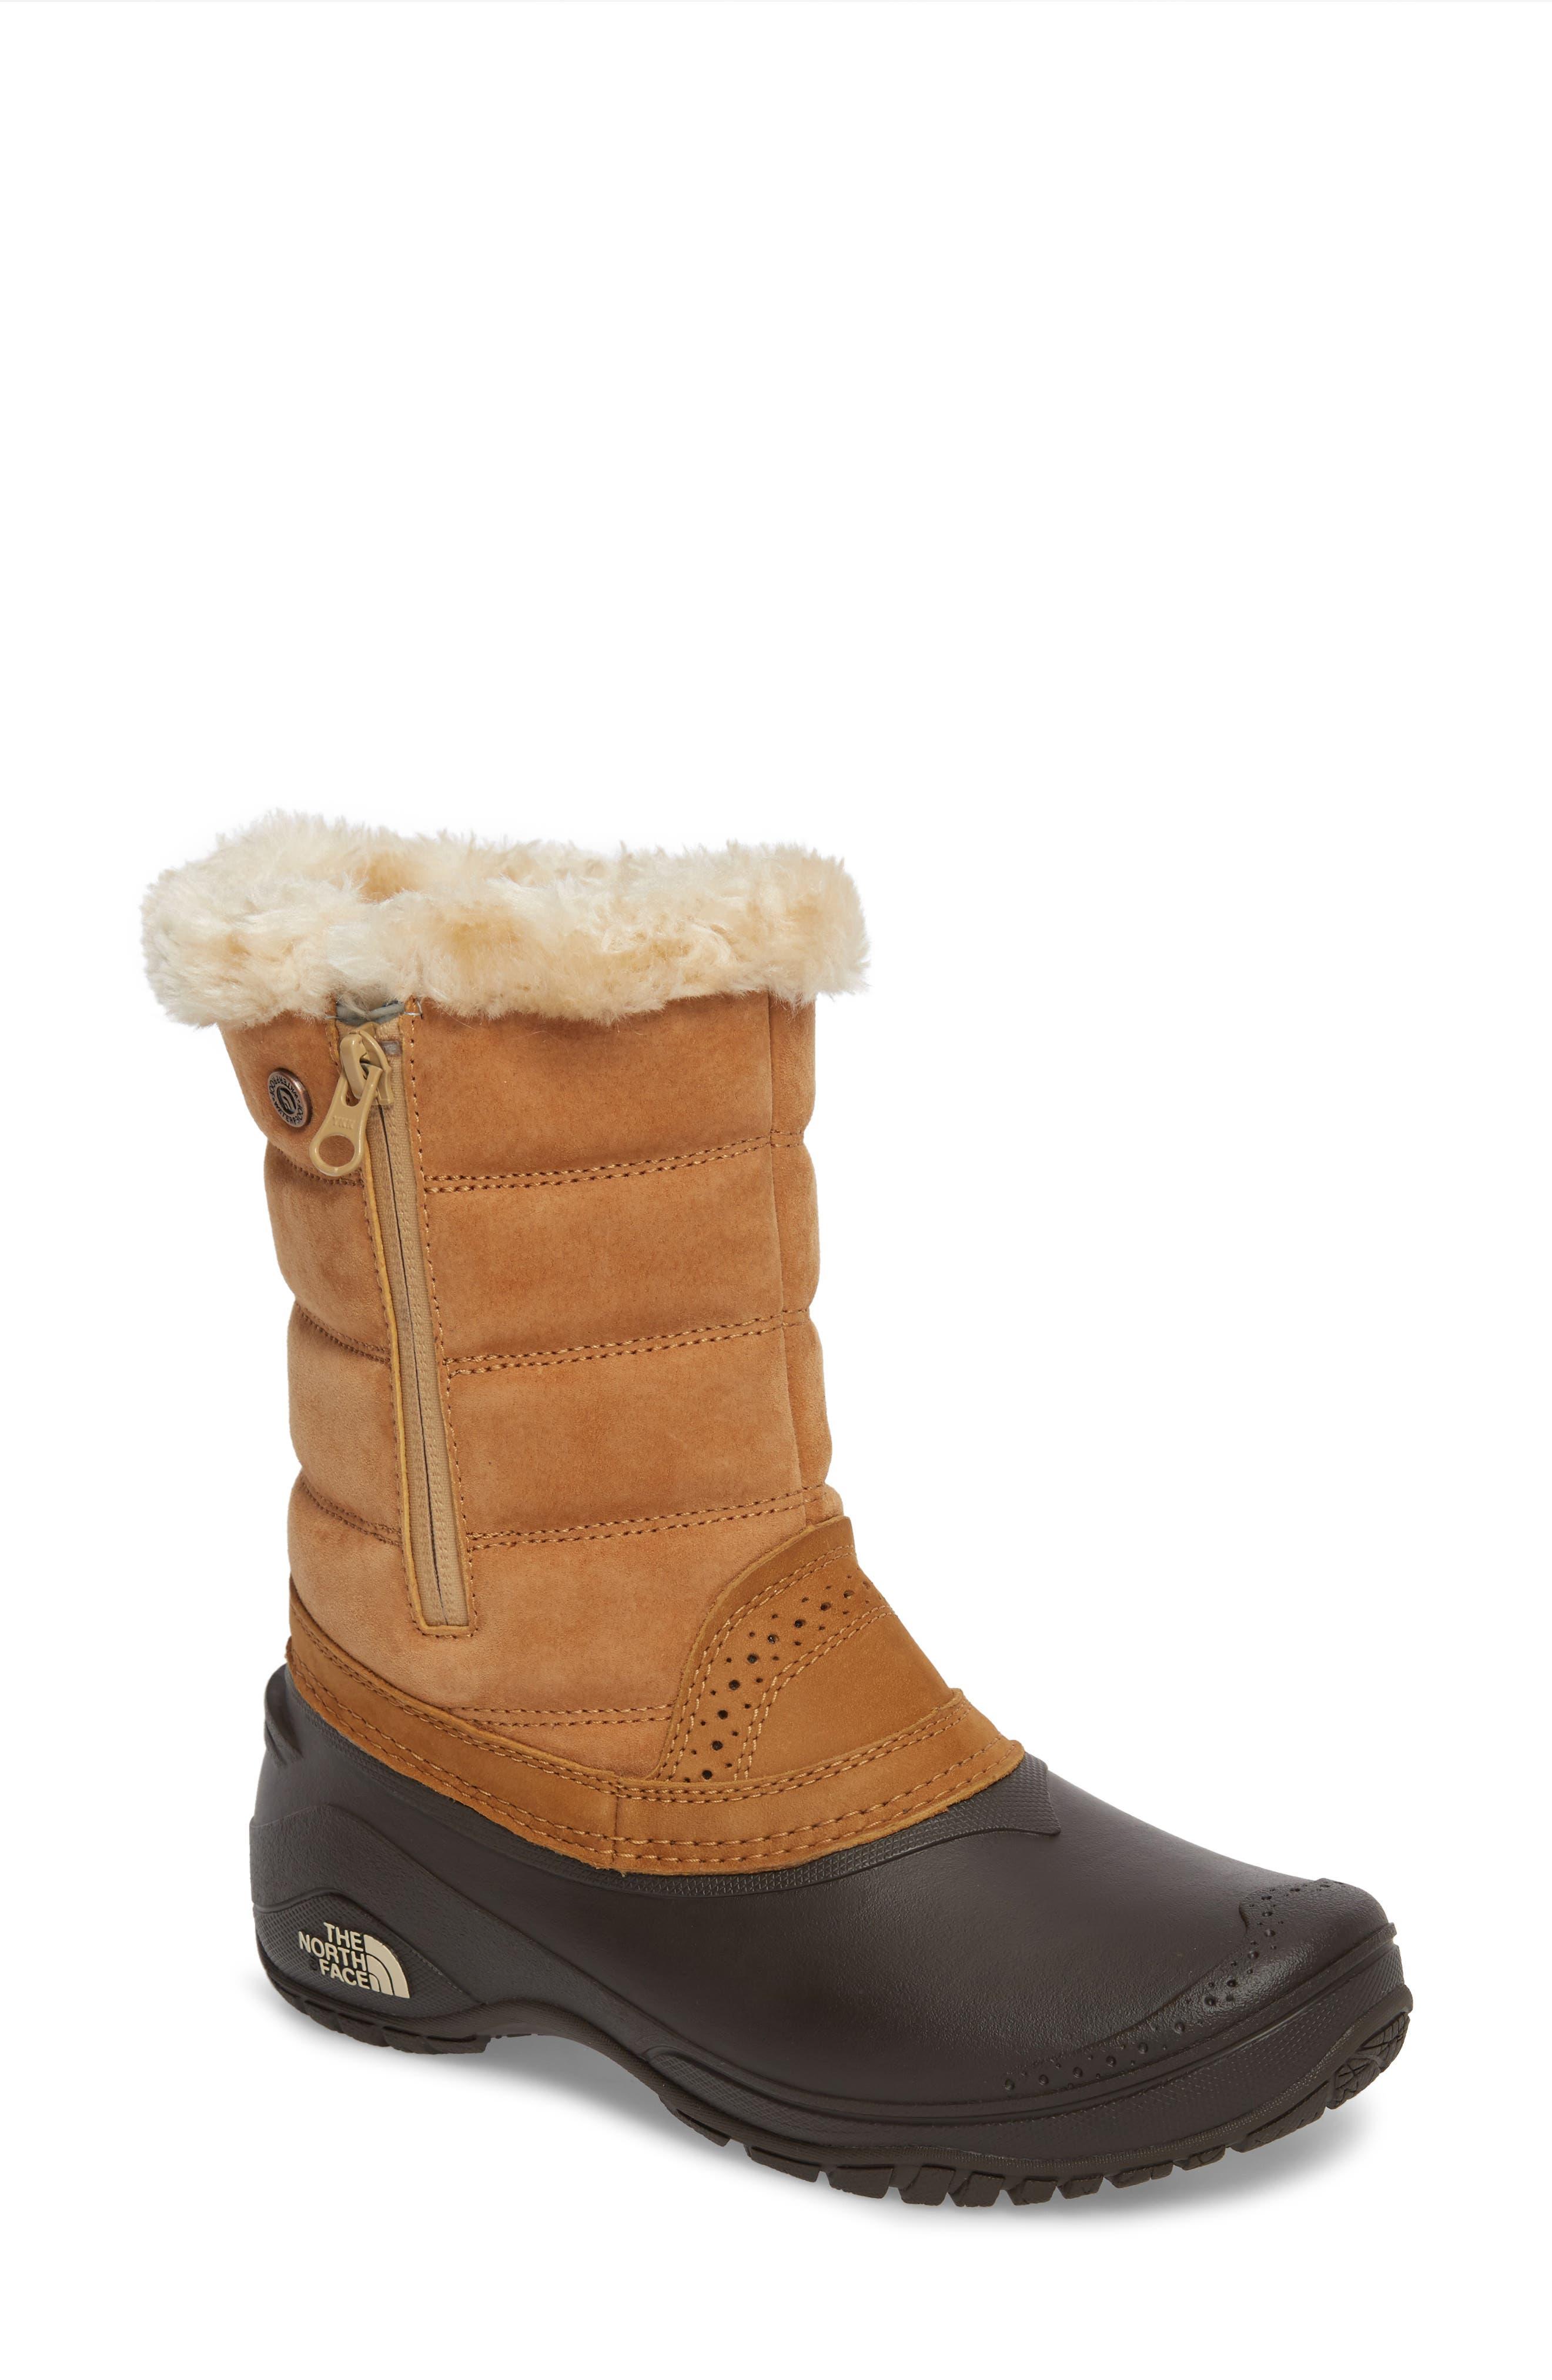 Shellista III Waterproof Pull-On Snow Boot,                             Main thumbnail 2, color,